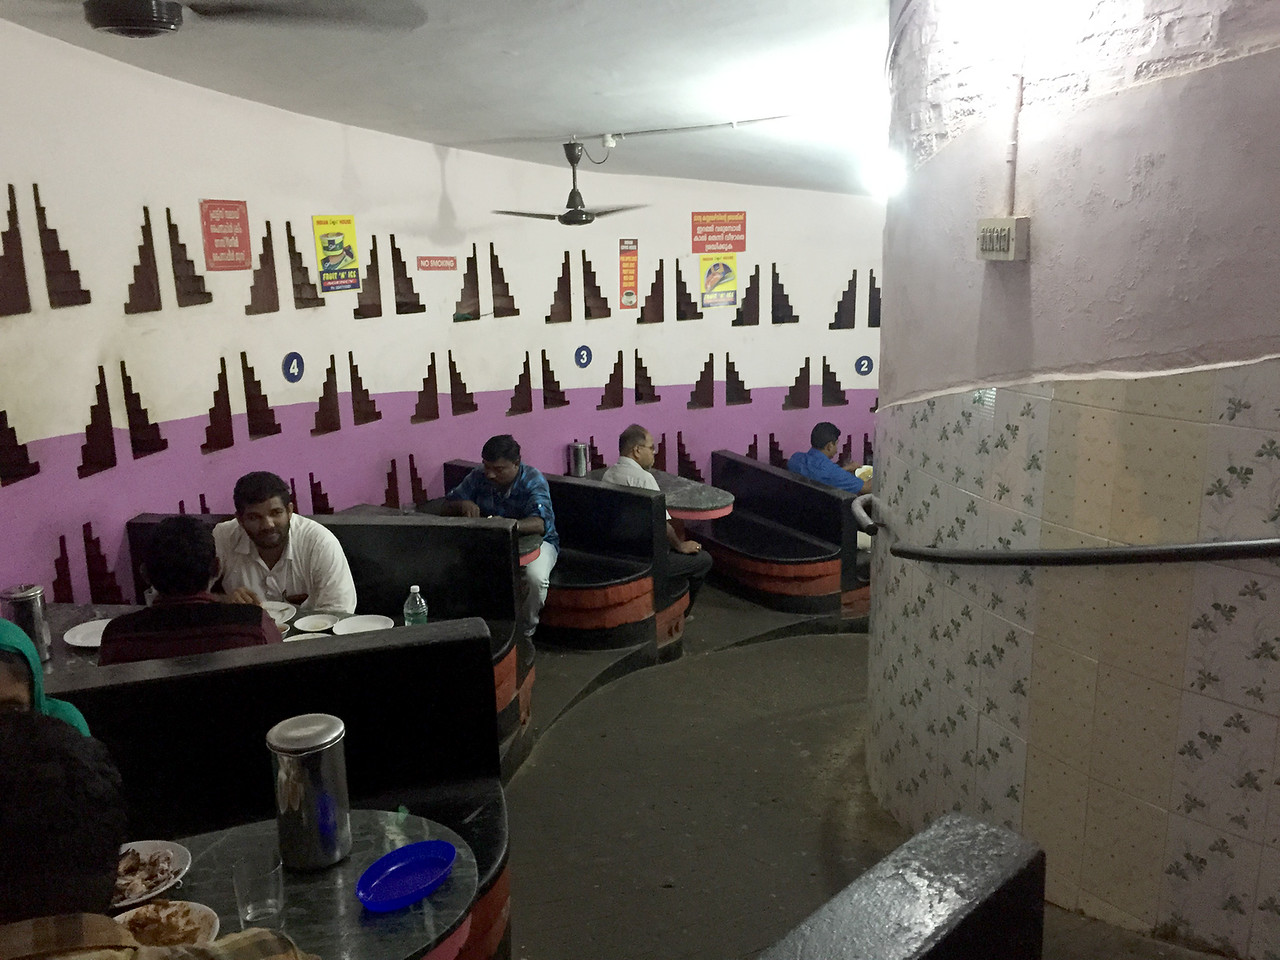 India Coffee House, Trivandrum, Kerala, India